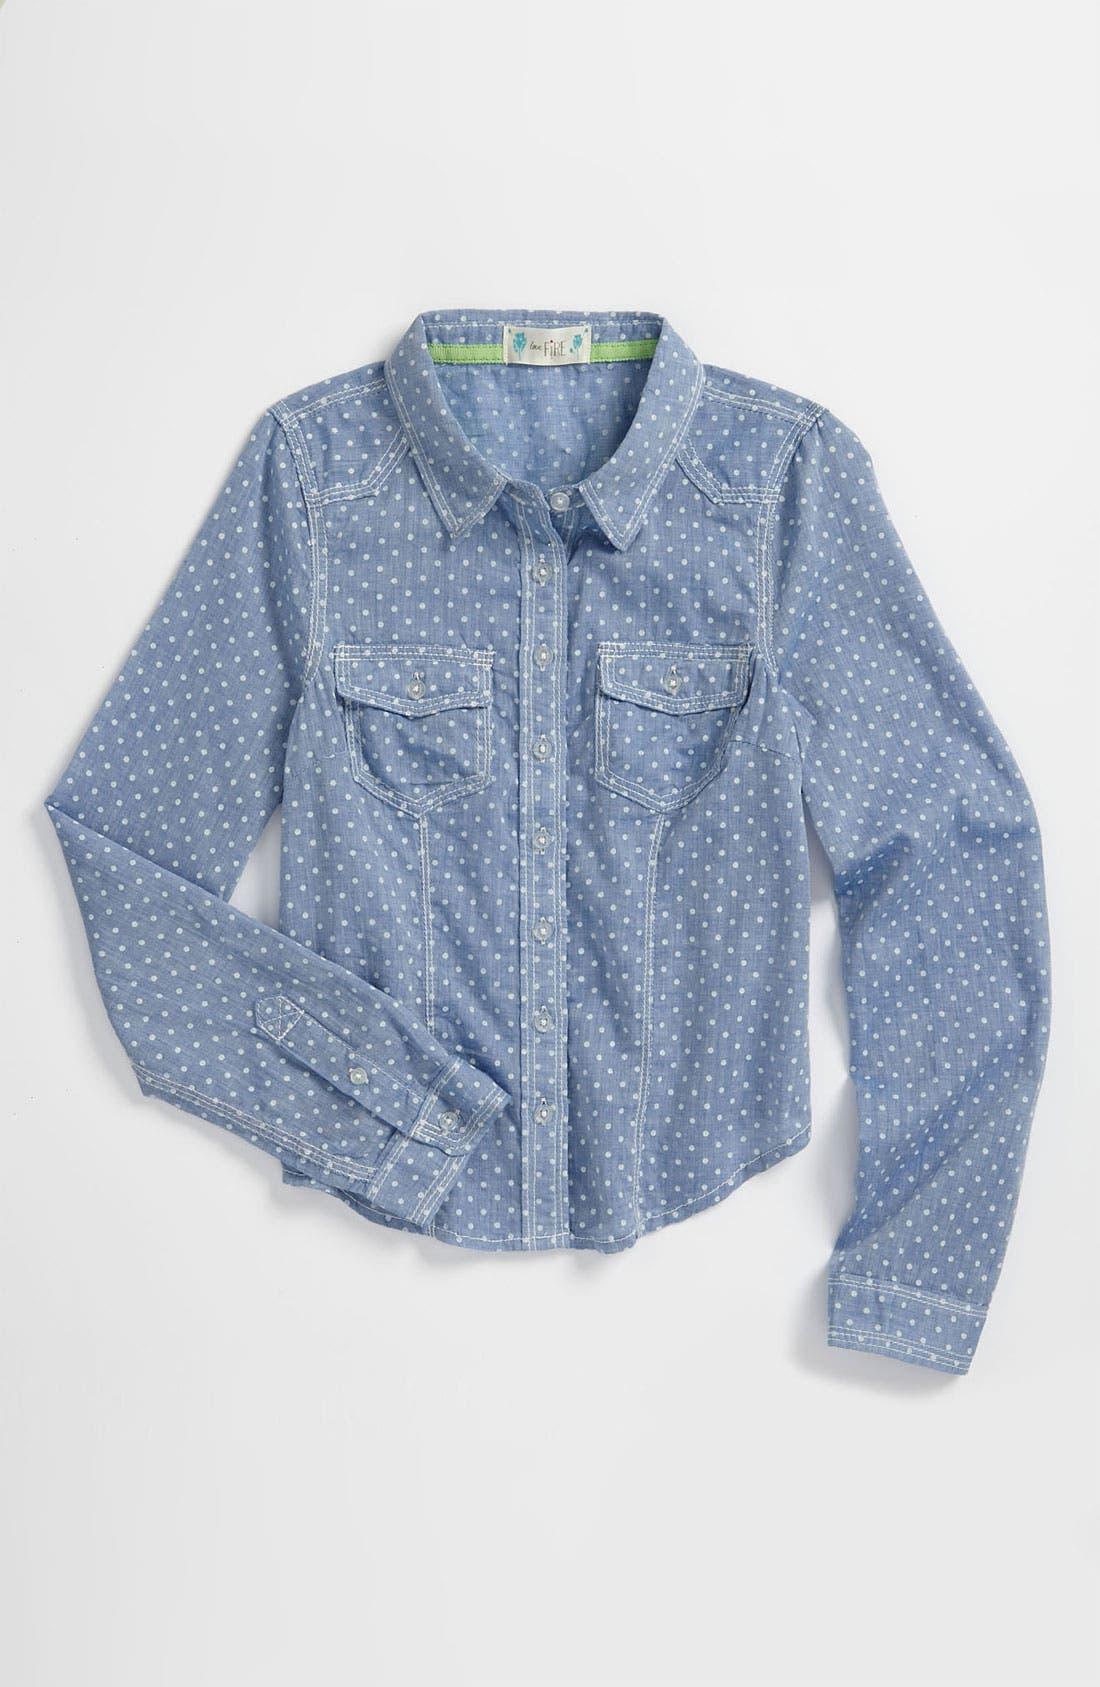 Main Image - Fire Polka Dot Chambray Shirt (Little Girls & Big Girls)